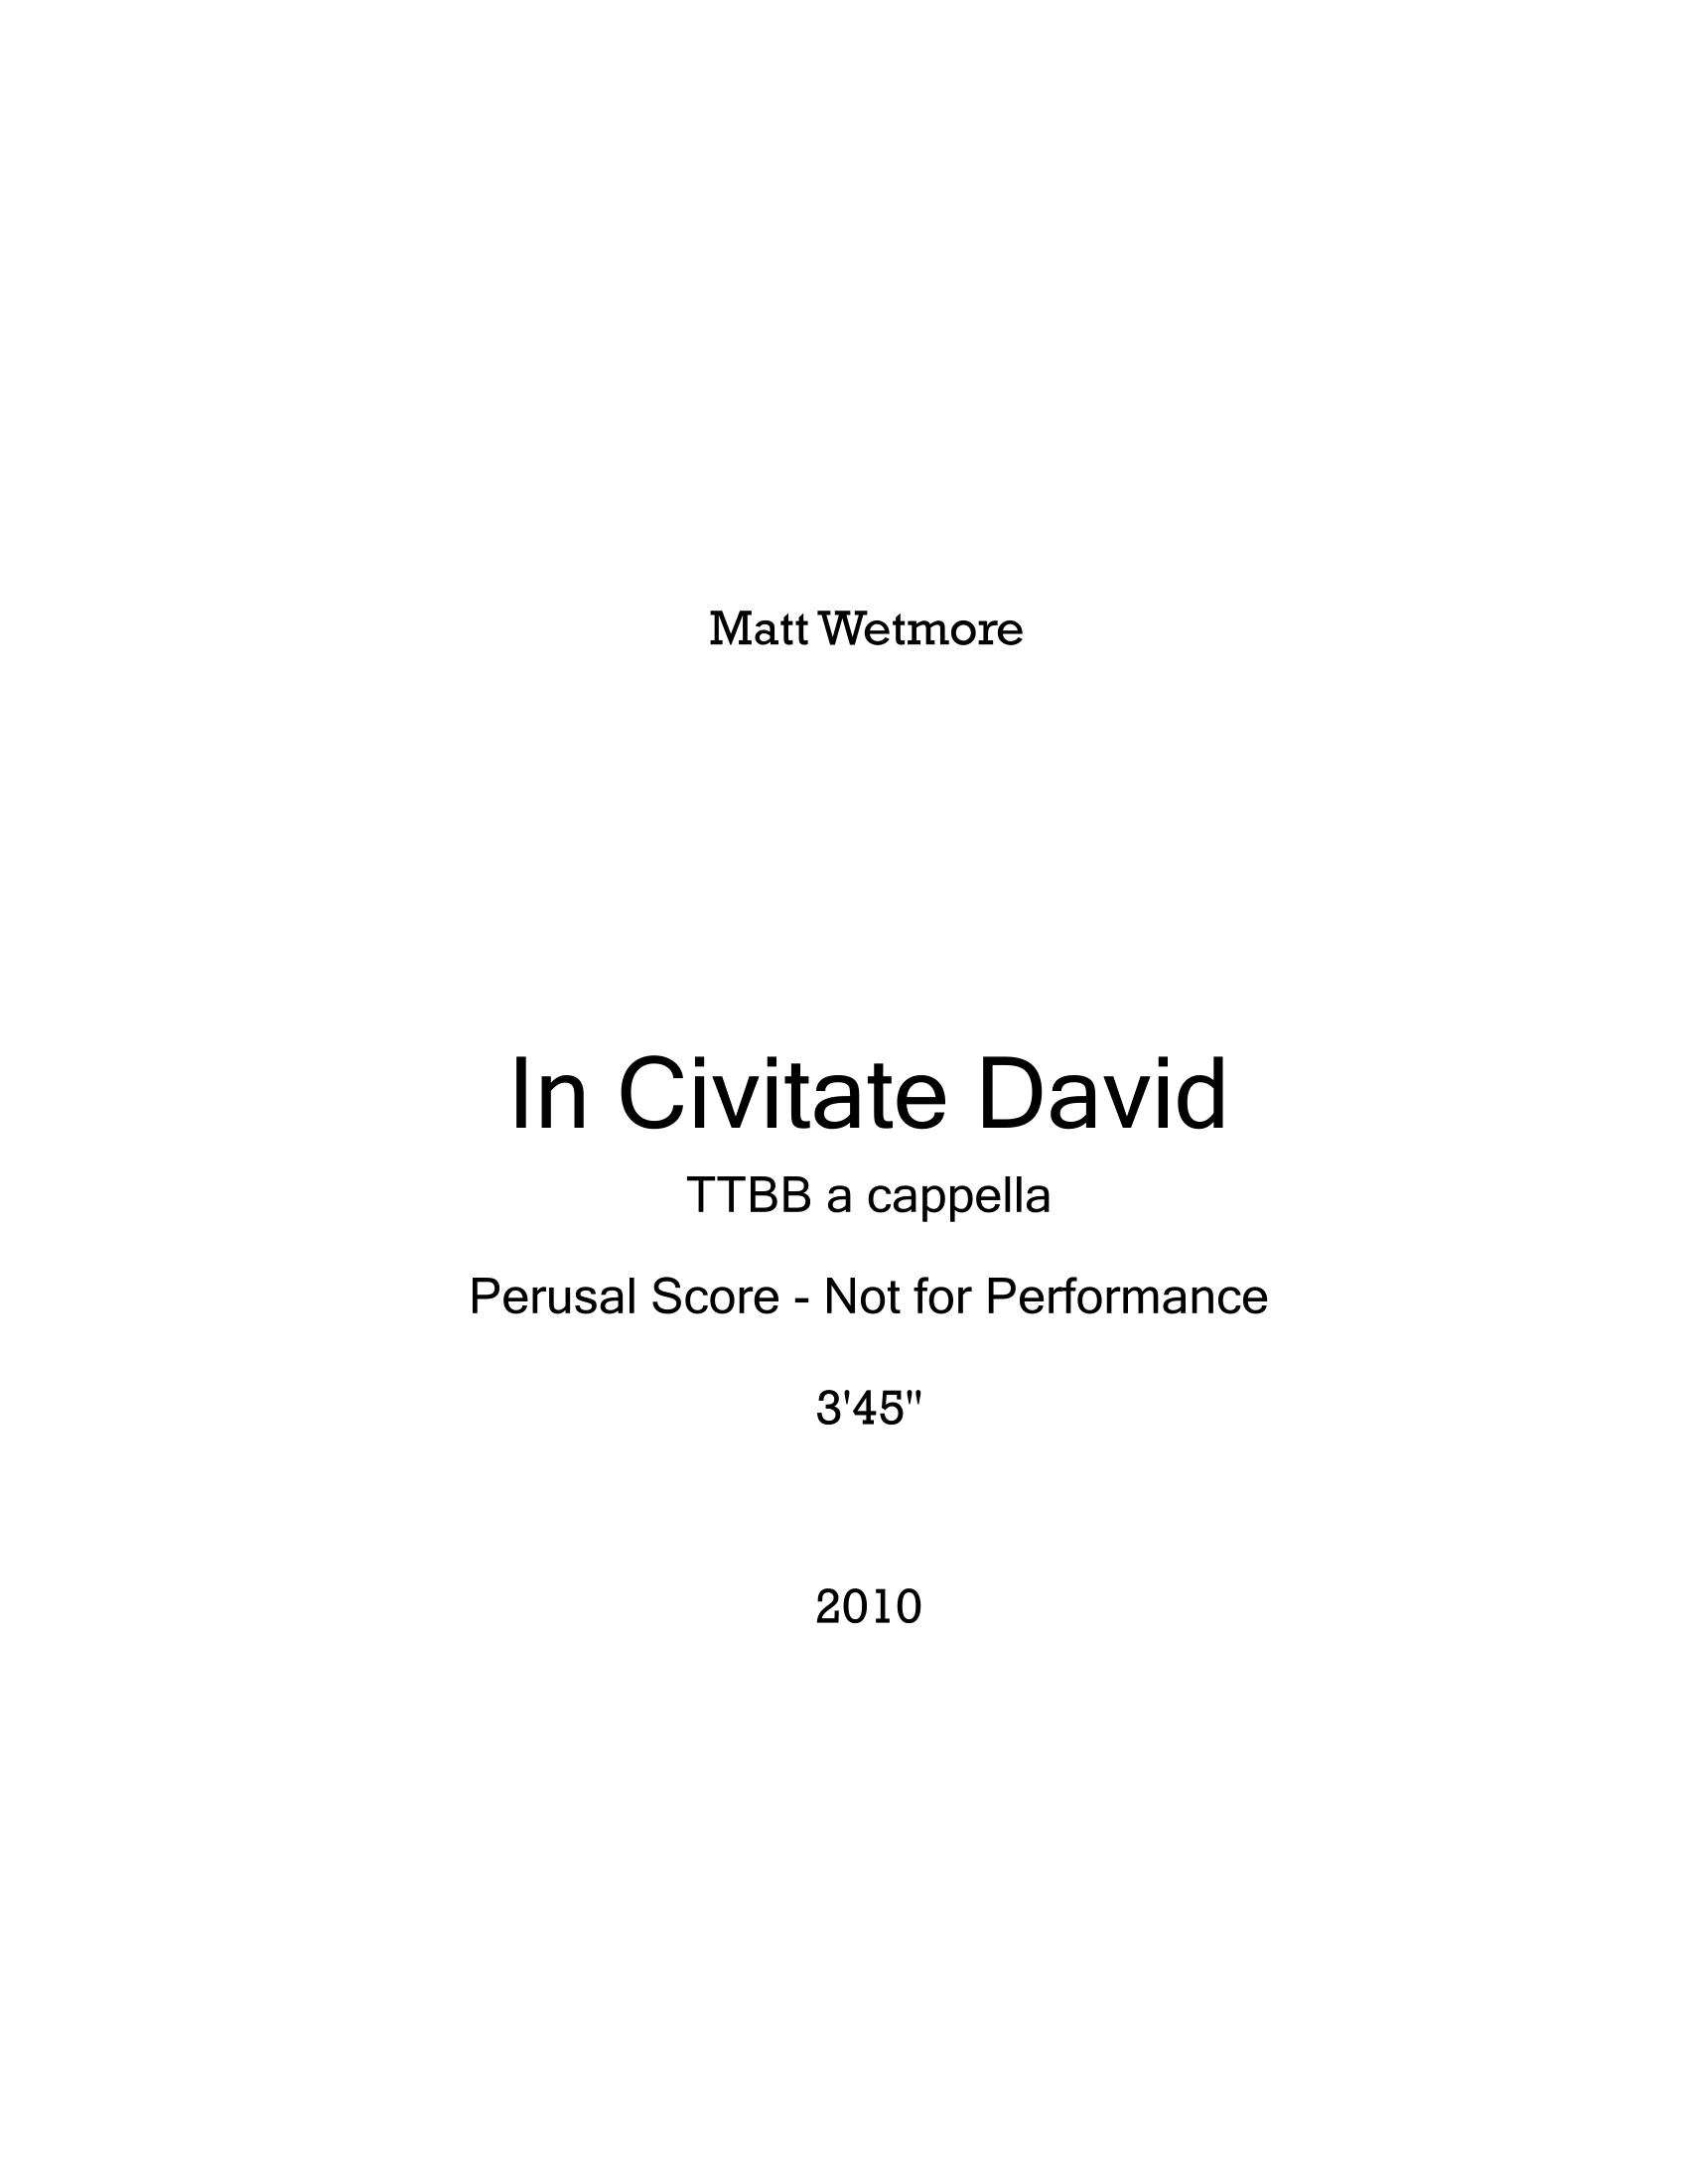 In Civitate David Perusal-1.png